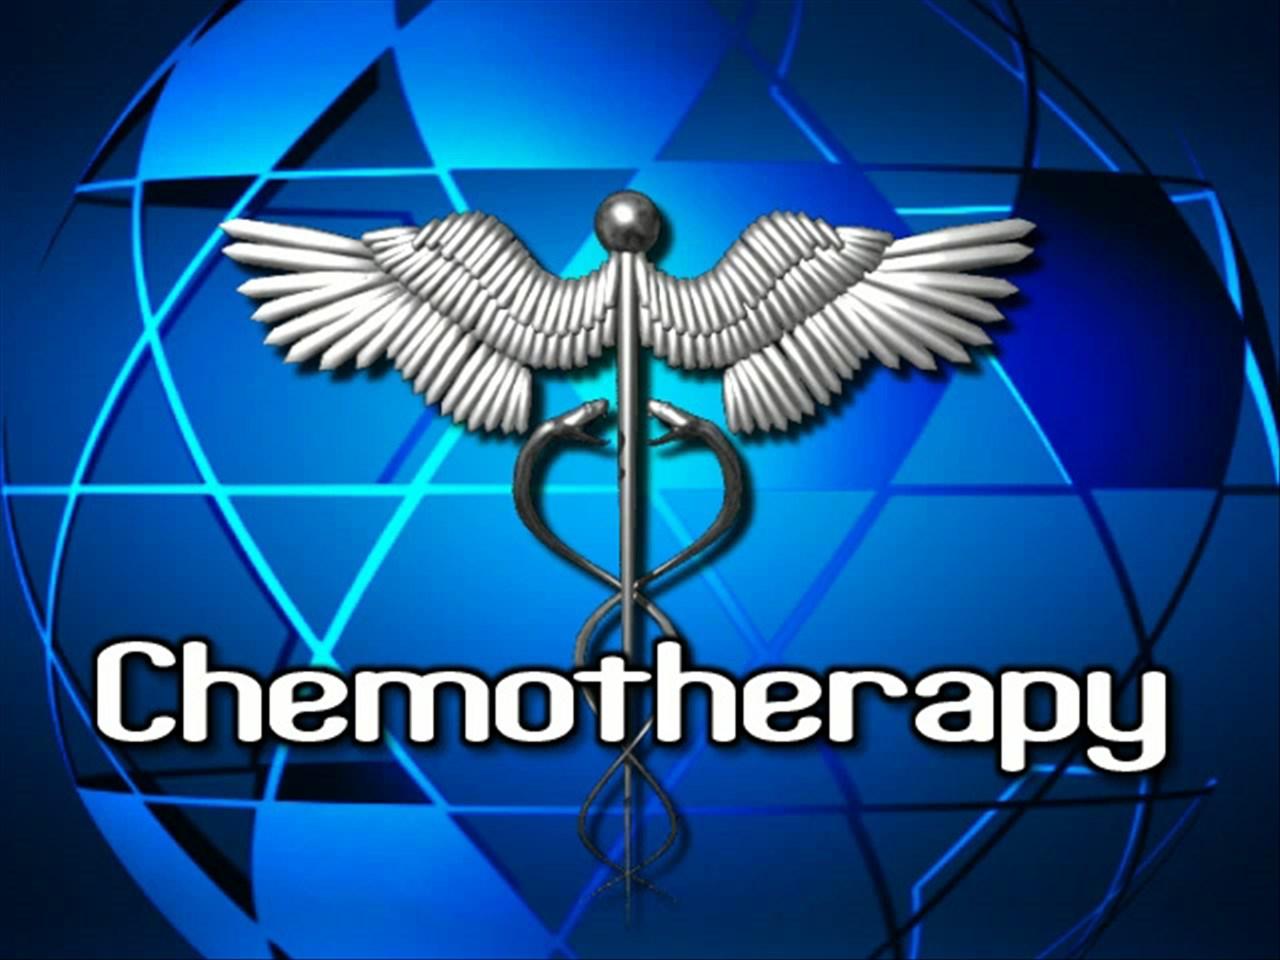 ChemotherapyMGN_154151